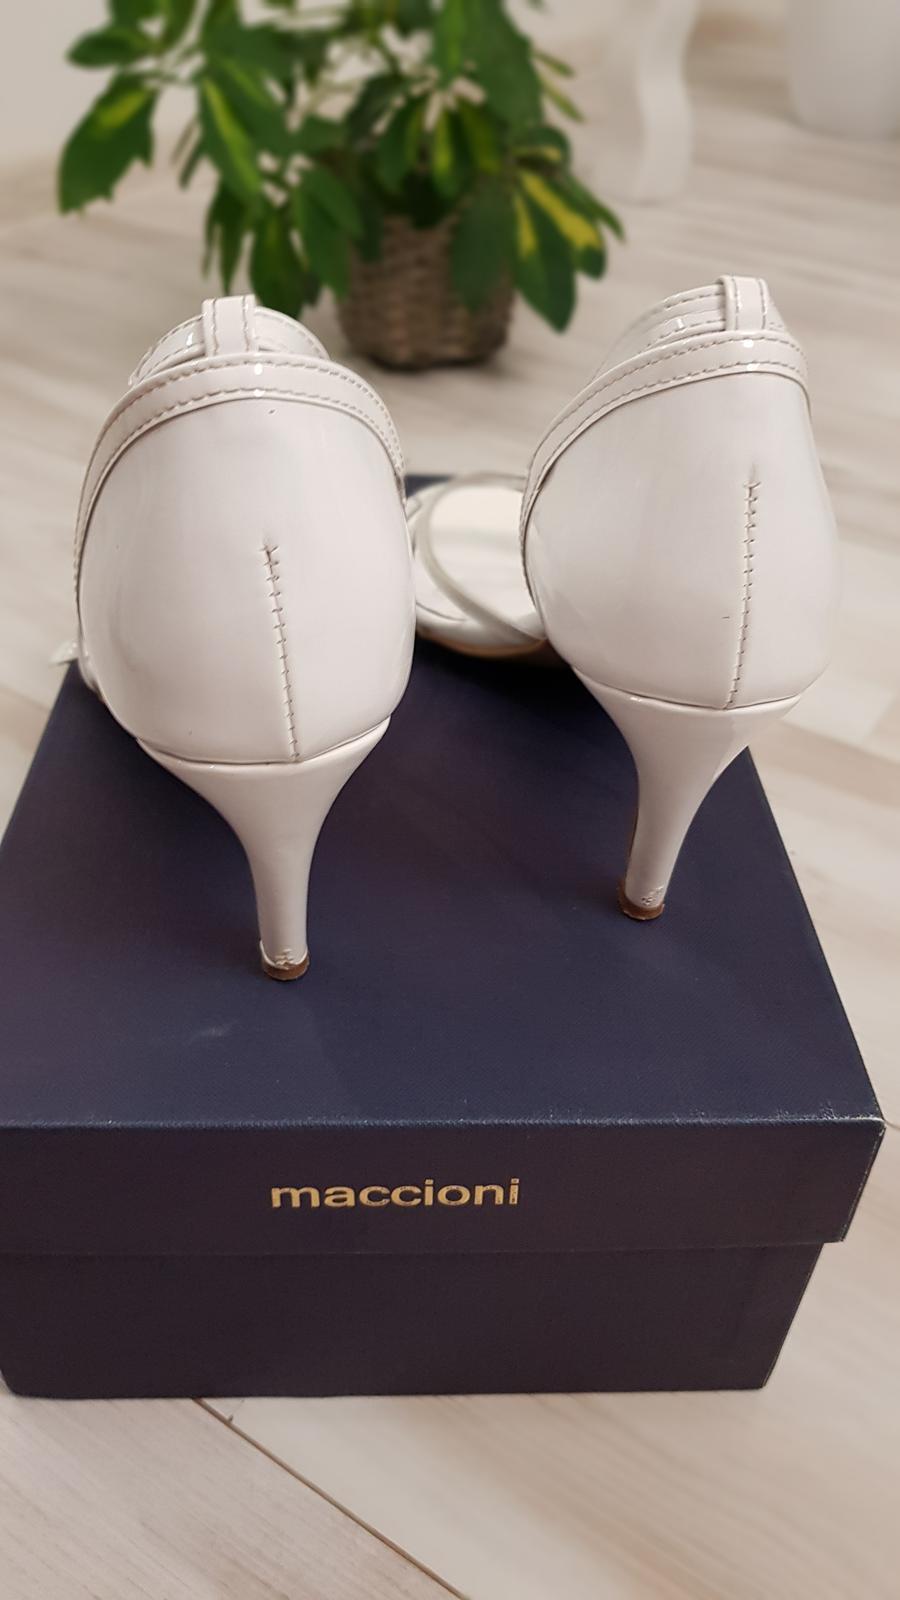 Svadobné topánky značky Maccioni - Obrázok č. 2